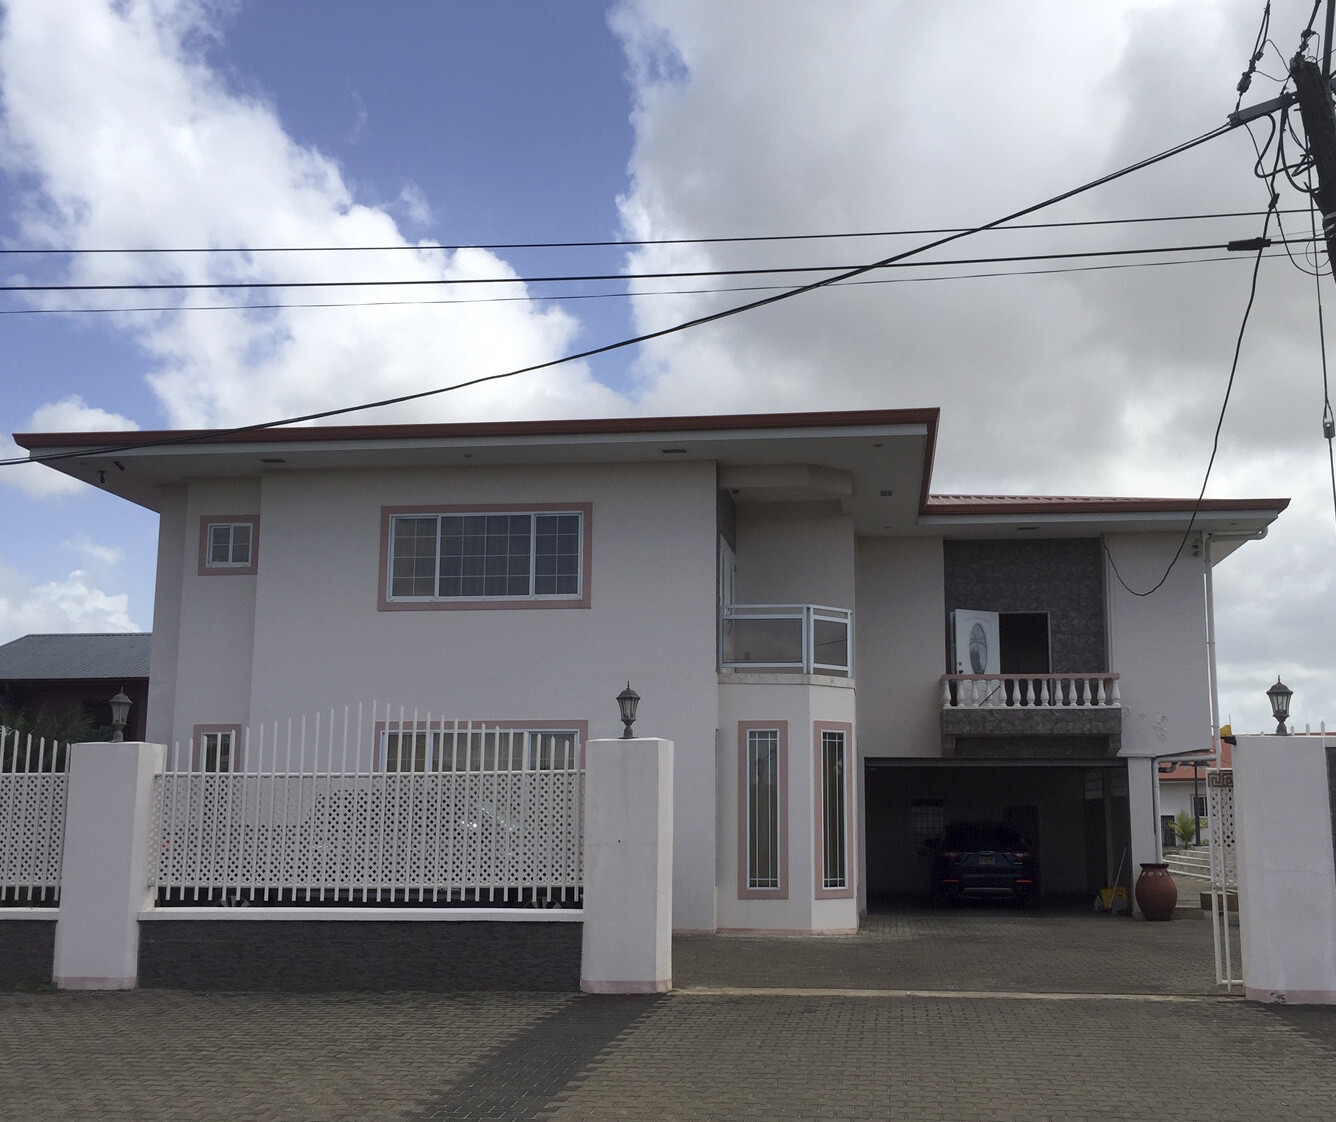 Hermitageweg 69 - Woning met vele mogelijkheden - Surgoed Makelaardij NV - Paramaribo, Suriname